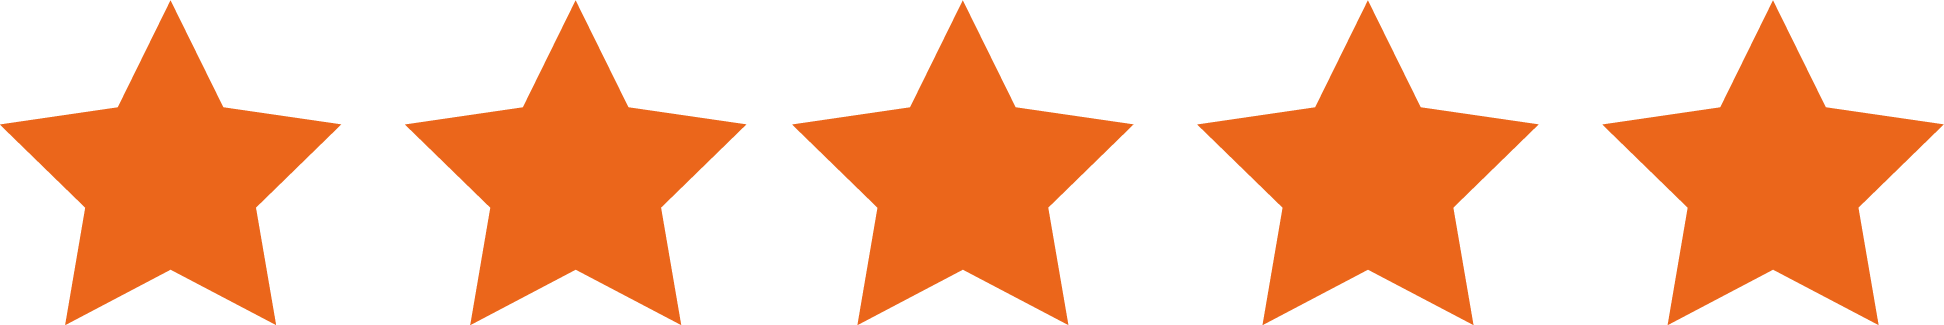 5 stars - Hit it happiness